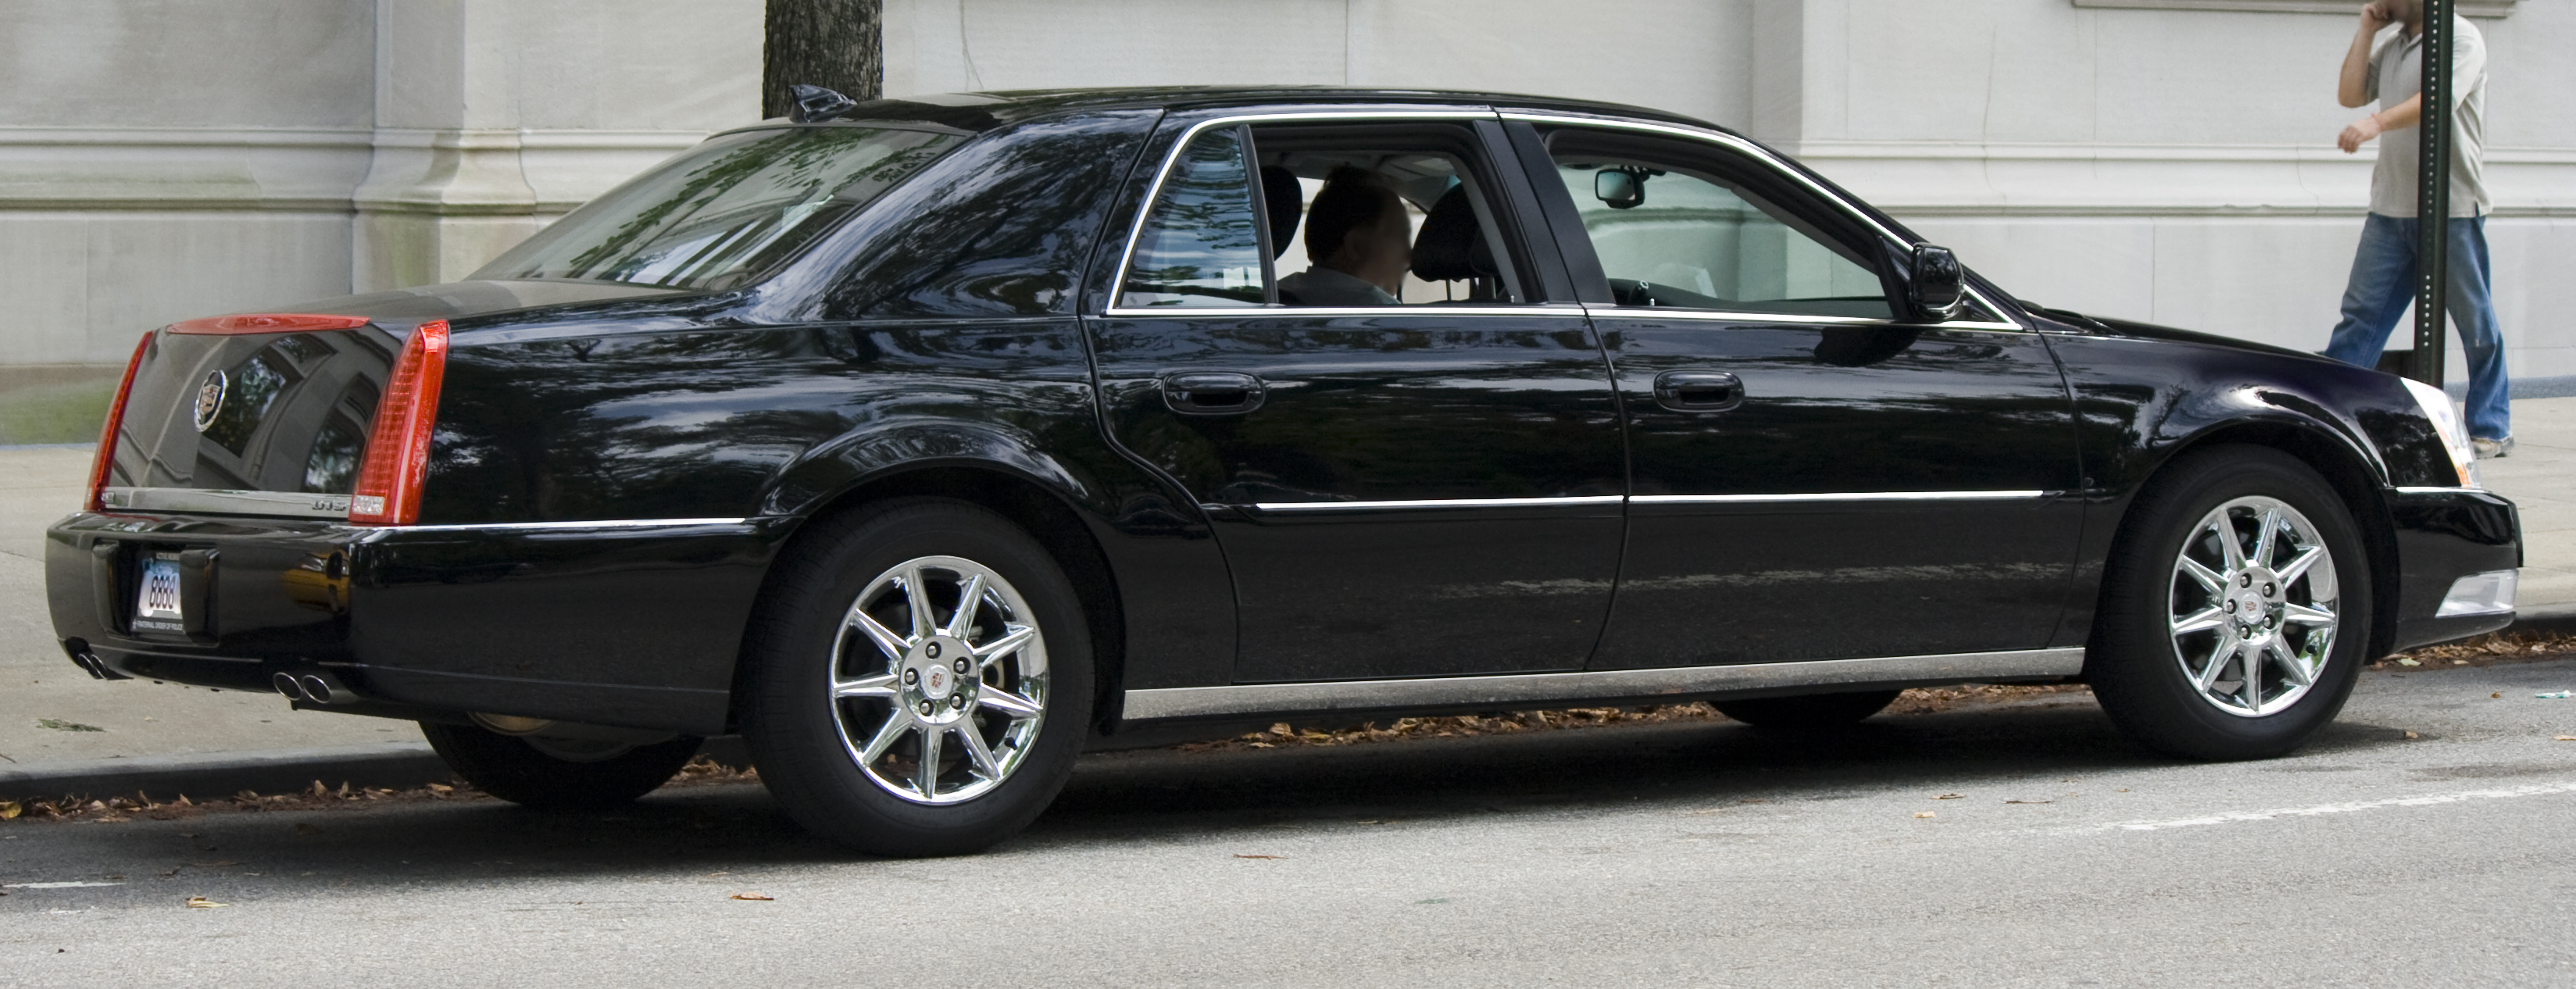 File:Cadillac DTS-L 2007.jpg - Wikimedia Commons